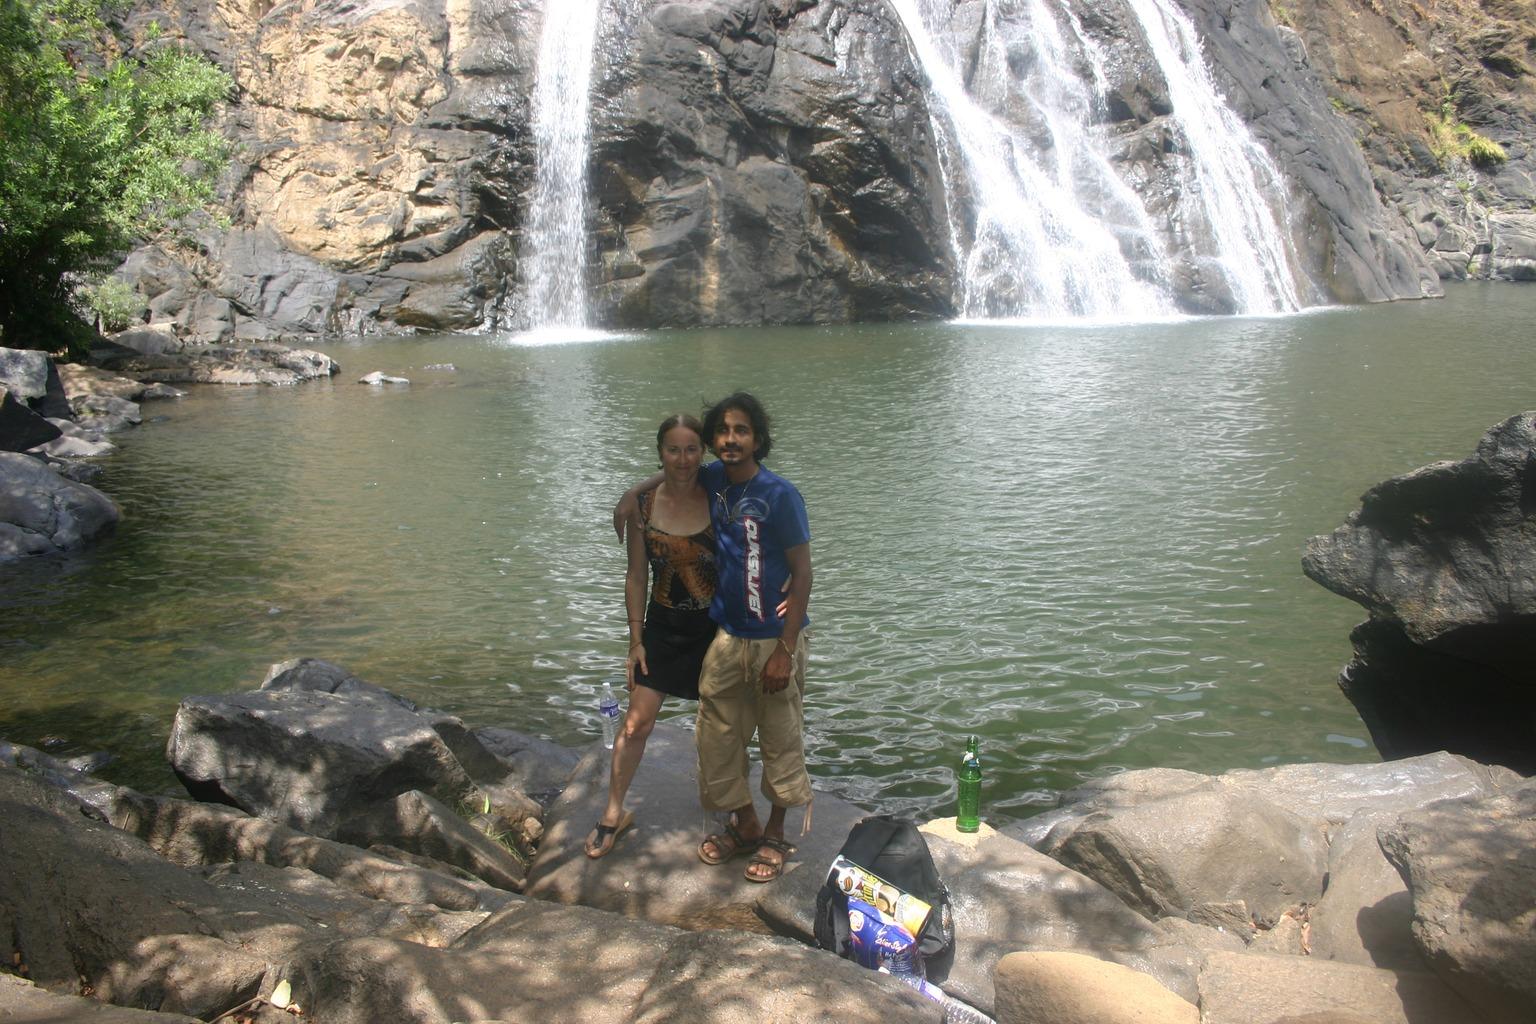 342c723ebf8 Foto Natur Fantasy Flusse Fantastische Welt High Elves Of Waterfall  Sanctuary: Top Waterfall In India Dudhsagar Falls